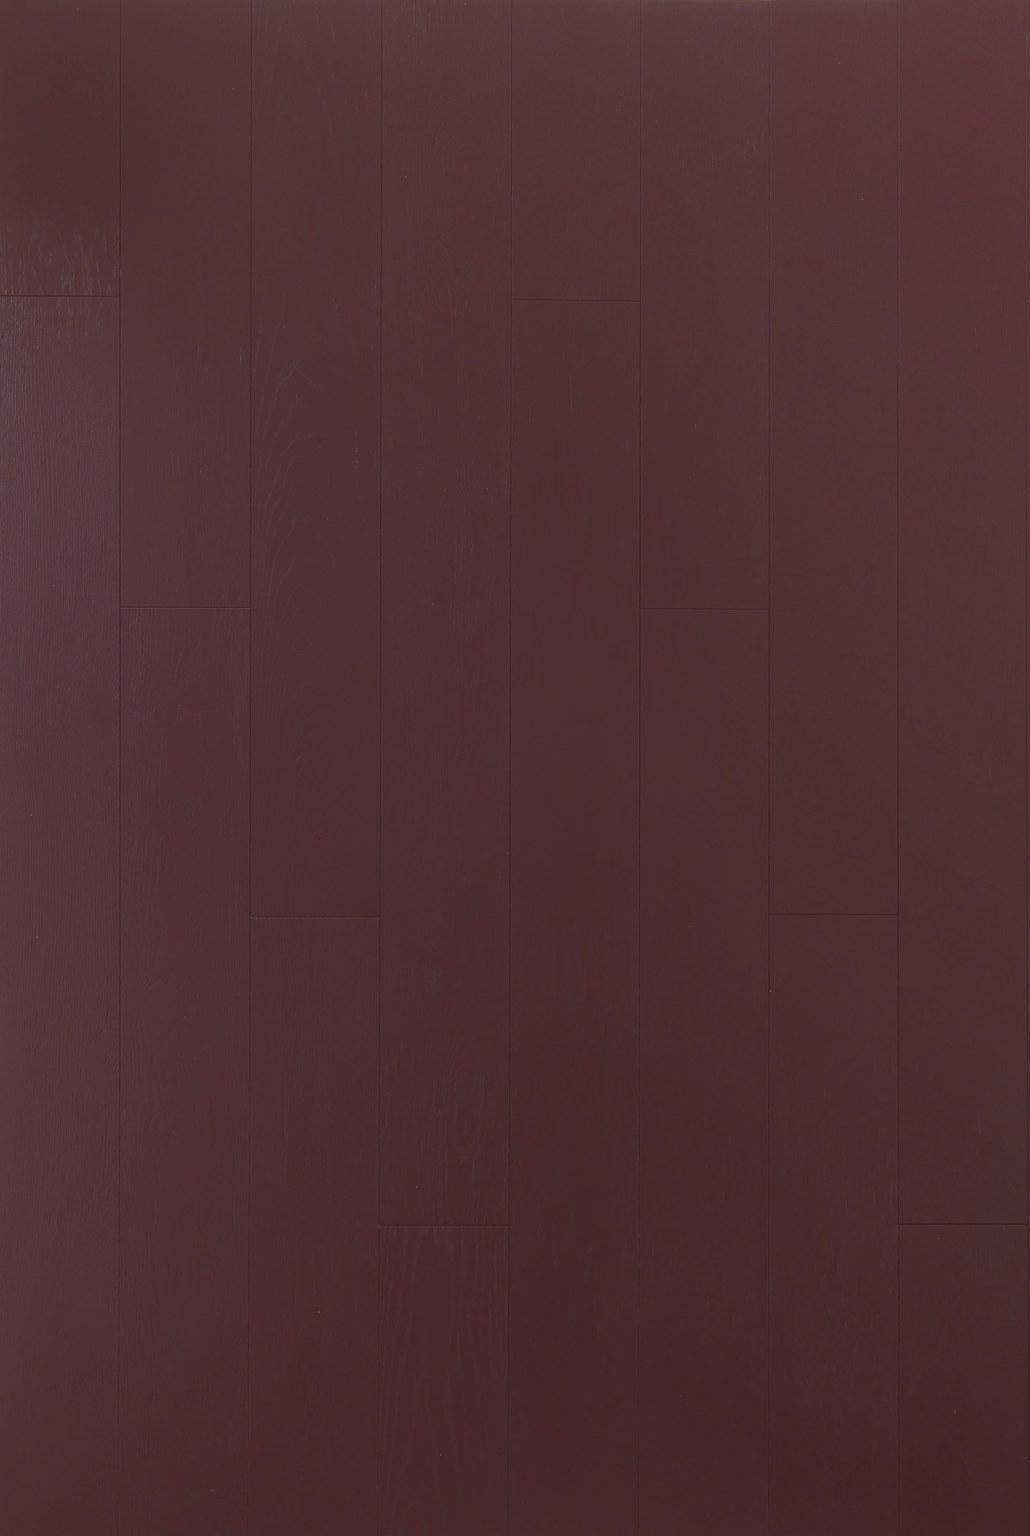 Timberwise parketti lankkuparketti puulattia wooden floor parquet plank Tammi Oak Classic Burgundy_2D1